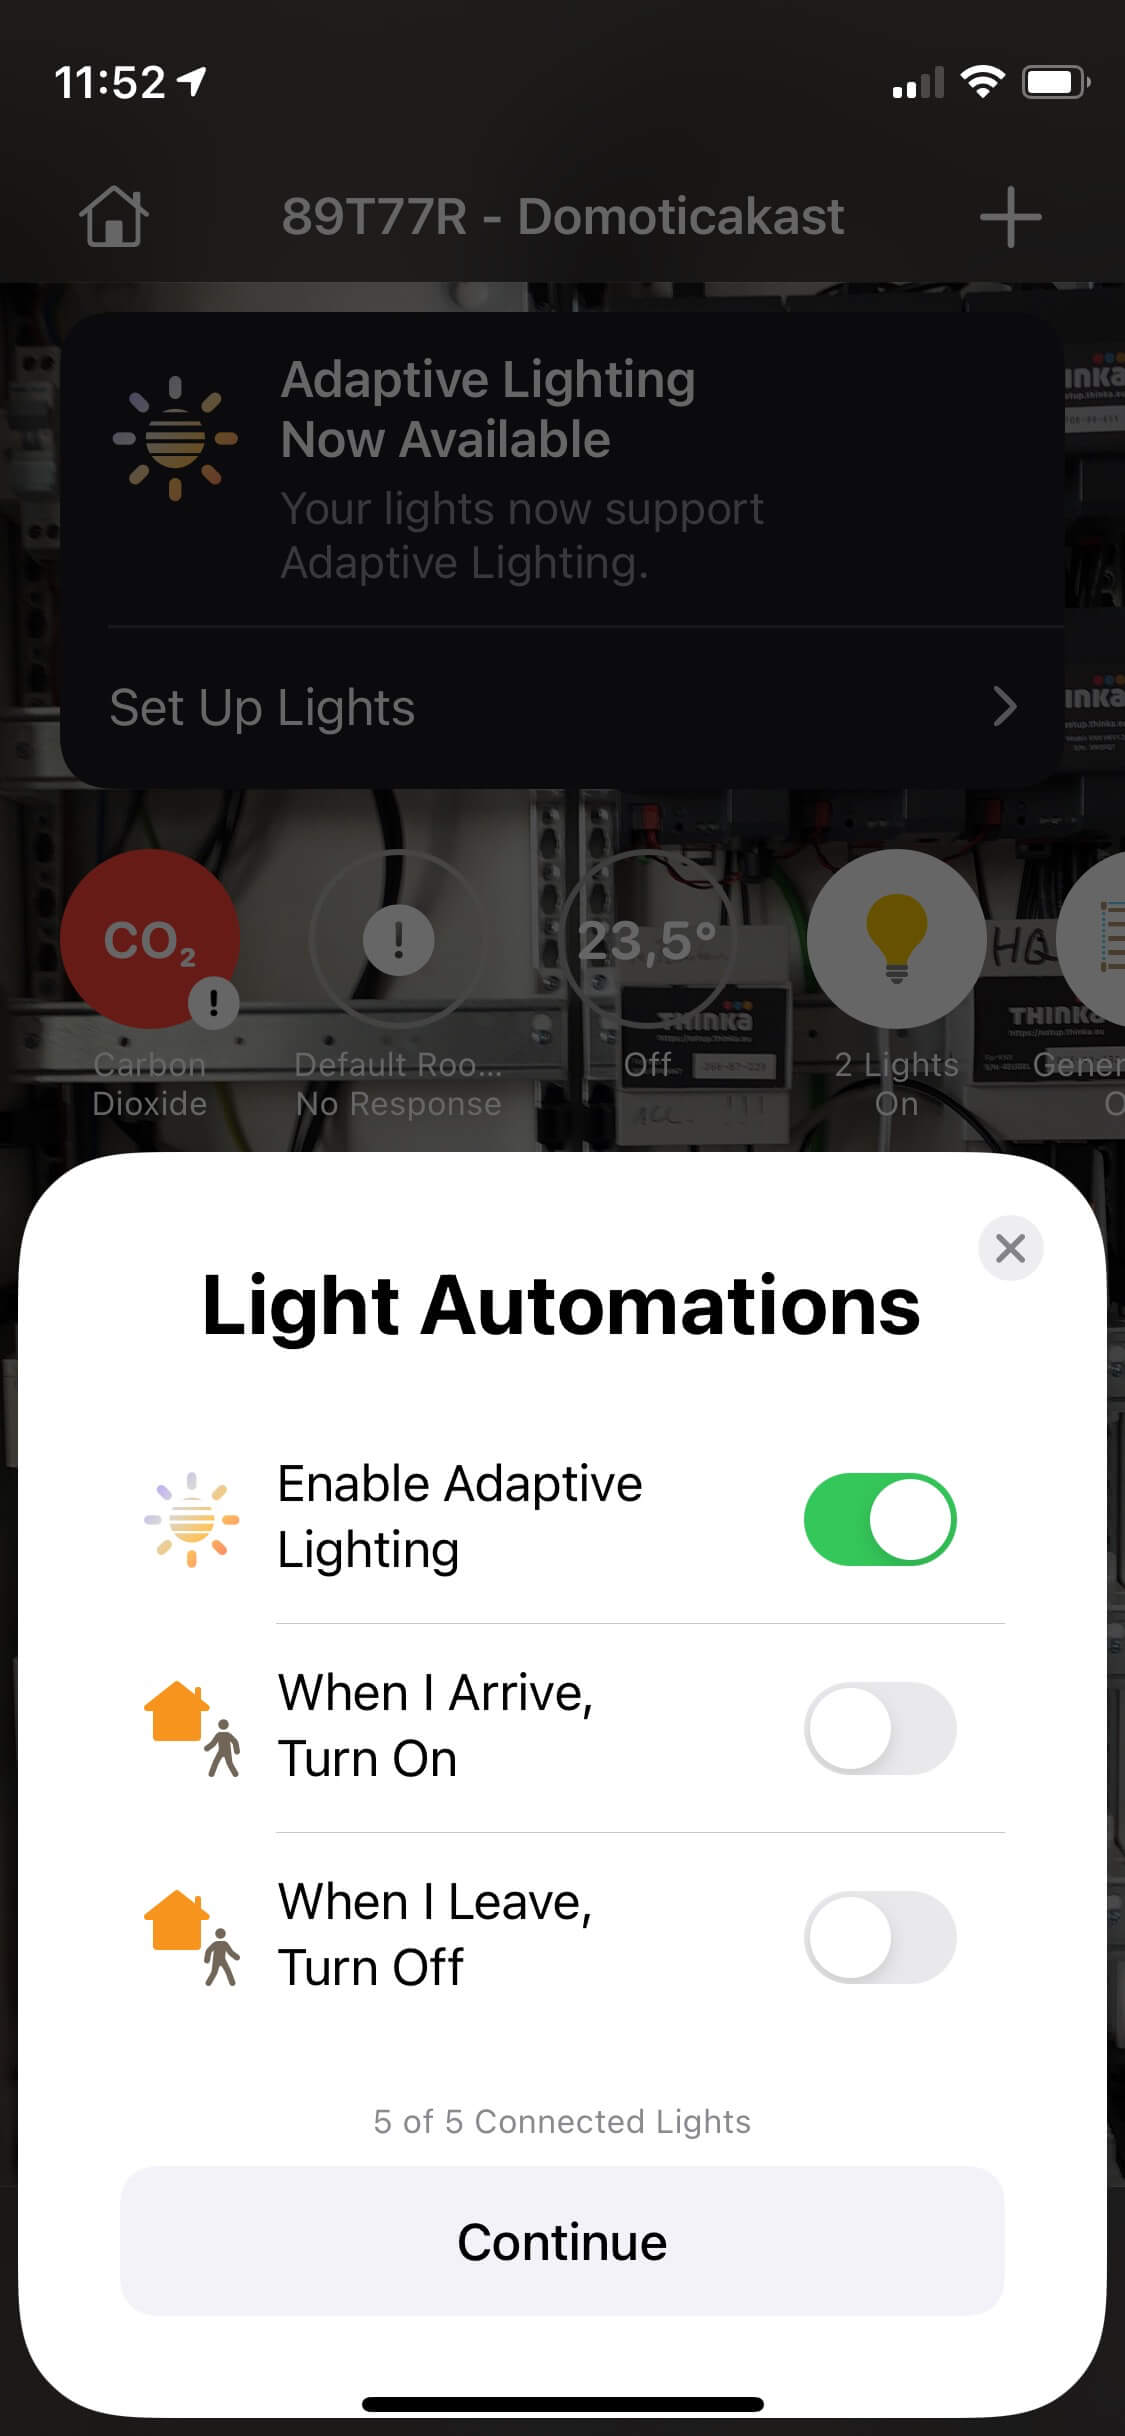 Adaptive Lighting turn on automation image